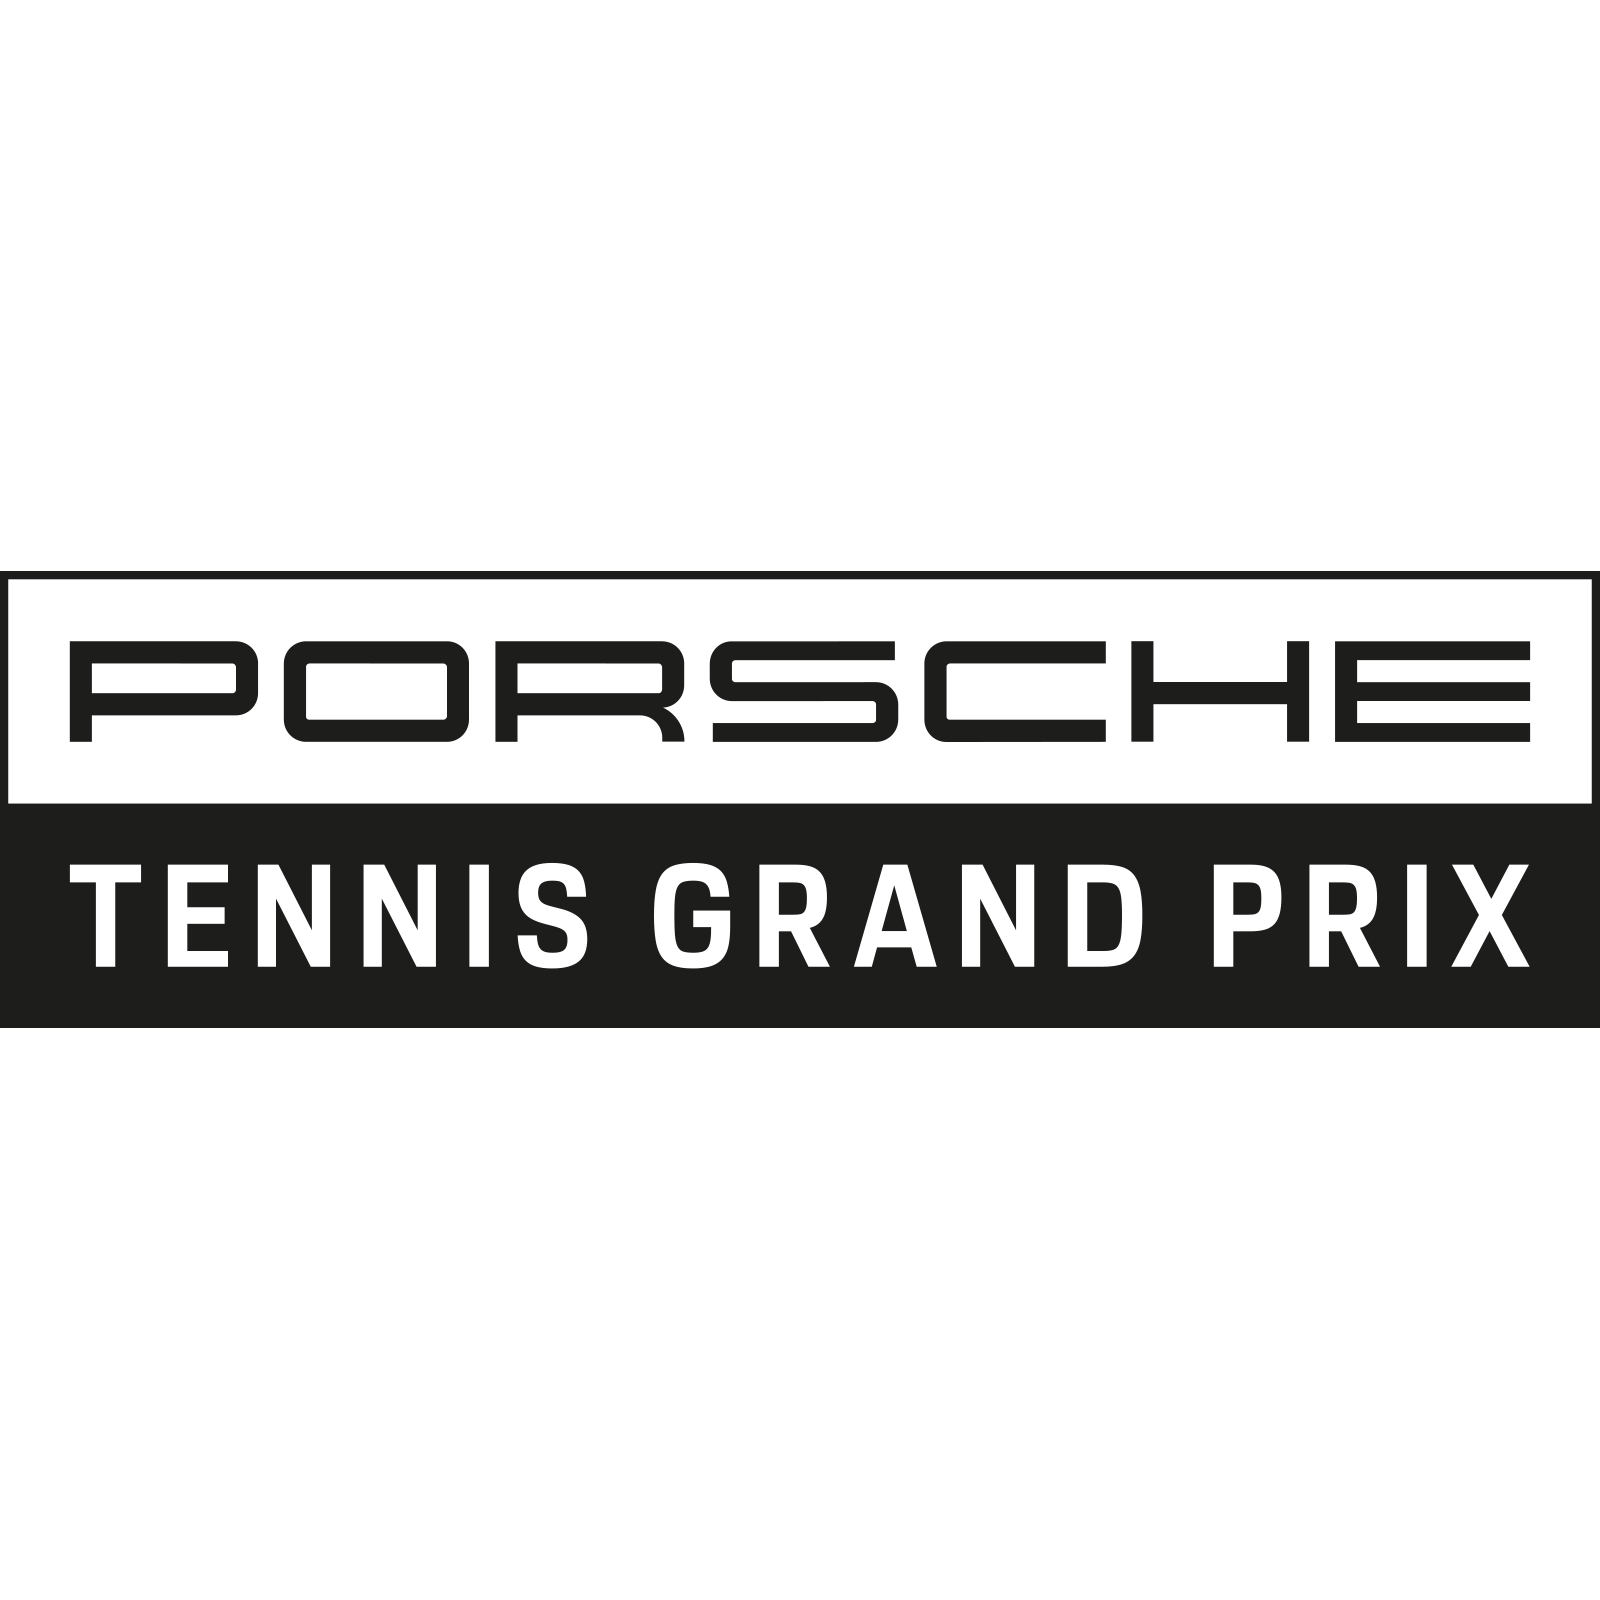 2019 WTA Tennis Premier Tour - Porsche Tennis Grand Prix